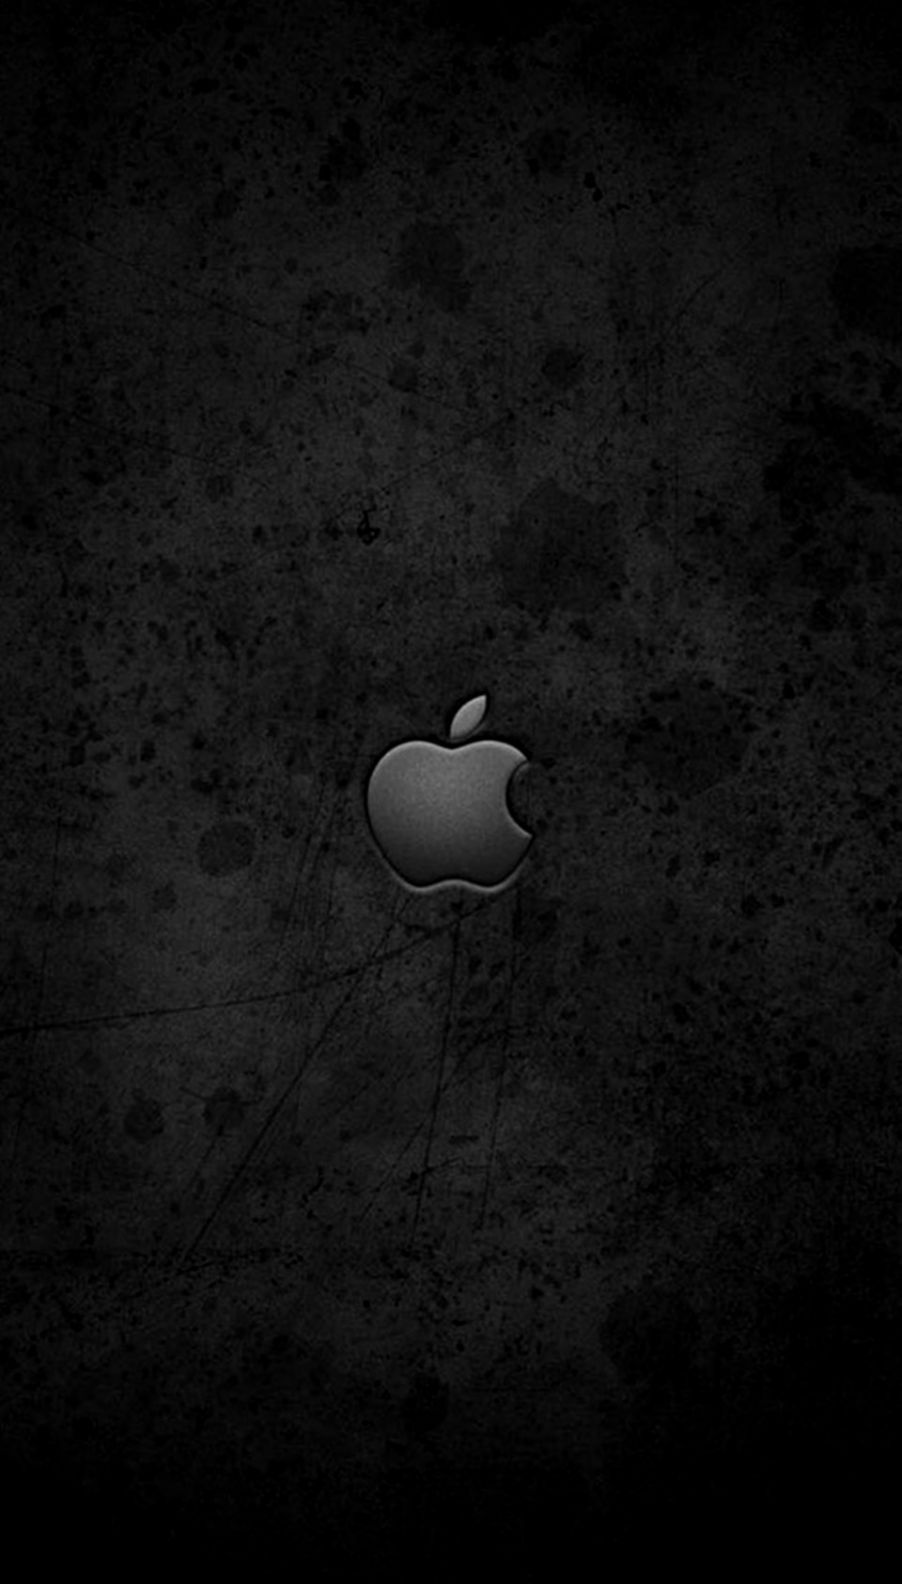 Pin Oleh Apple Wallpaper Di Apple Wallpaper Di 2020 Apple Logo Seni Gelap Latar Belakang